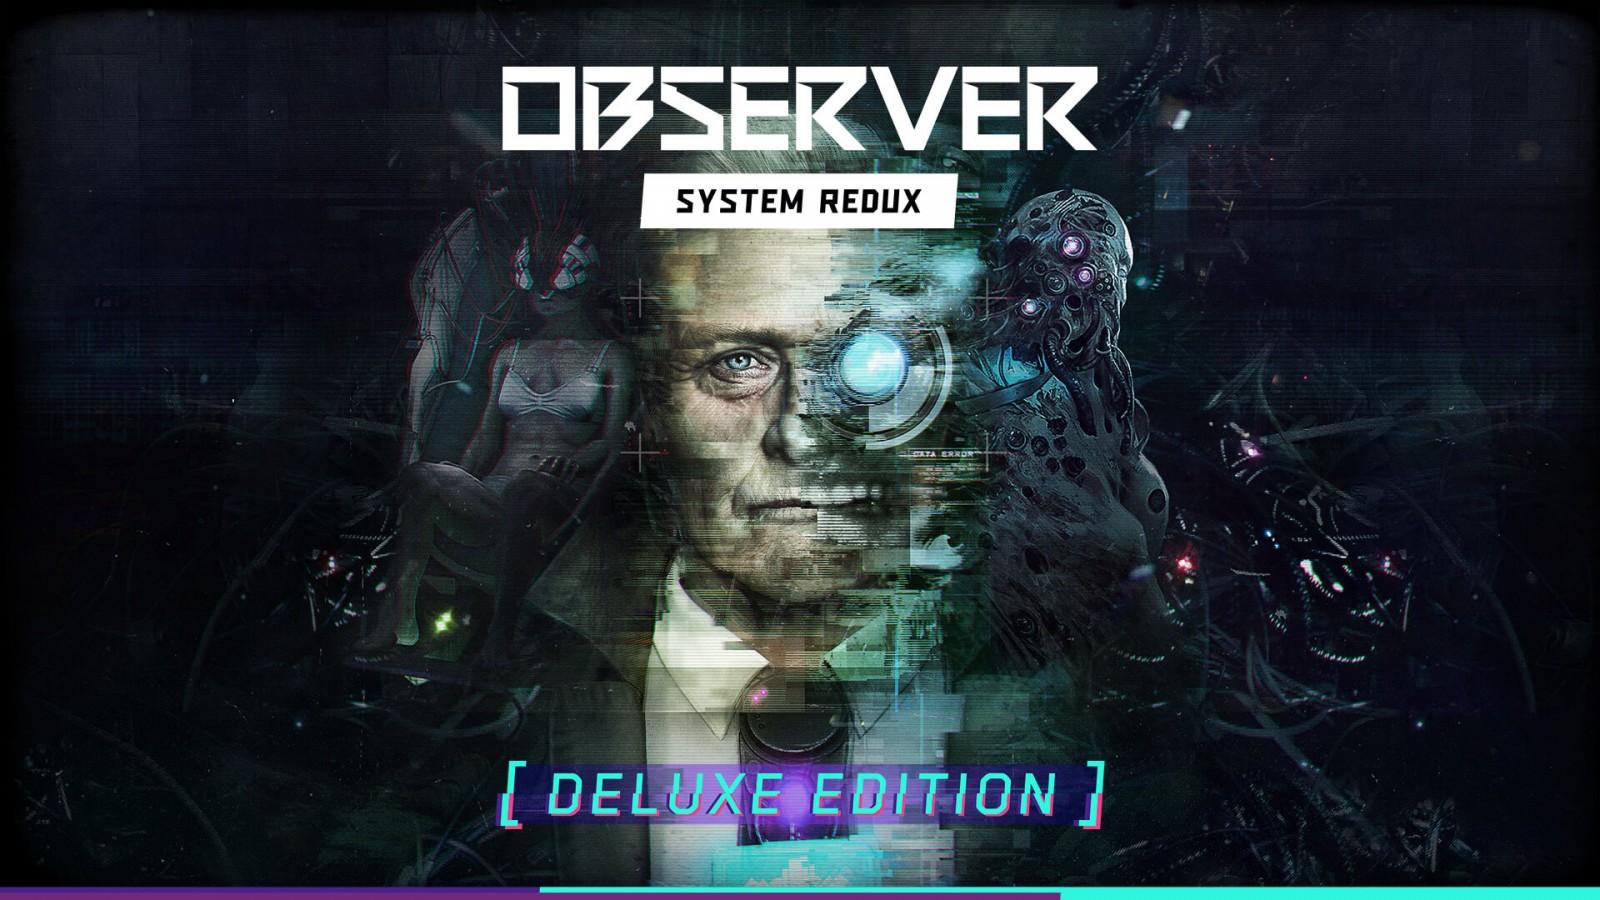 El Thriller Cyberpunk de Bloober Team Observer: System Redux, ya esta disponible en PlayStation 4 y Xbox One.